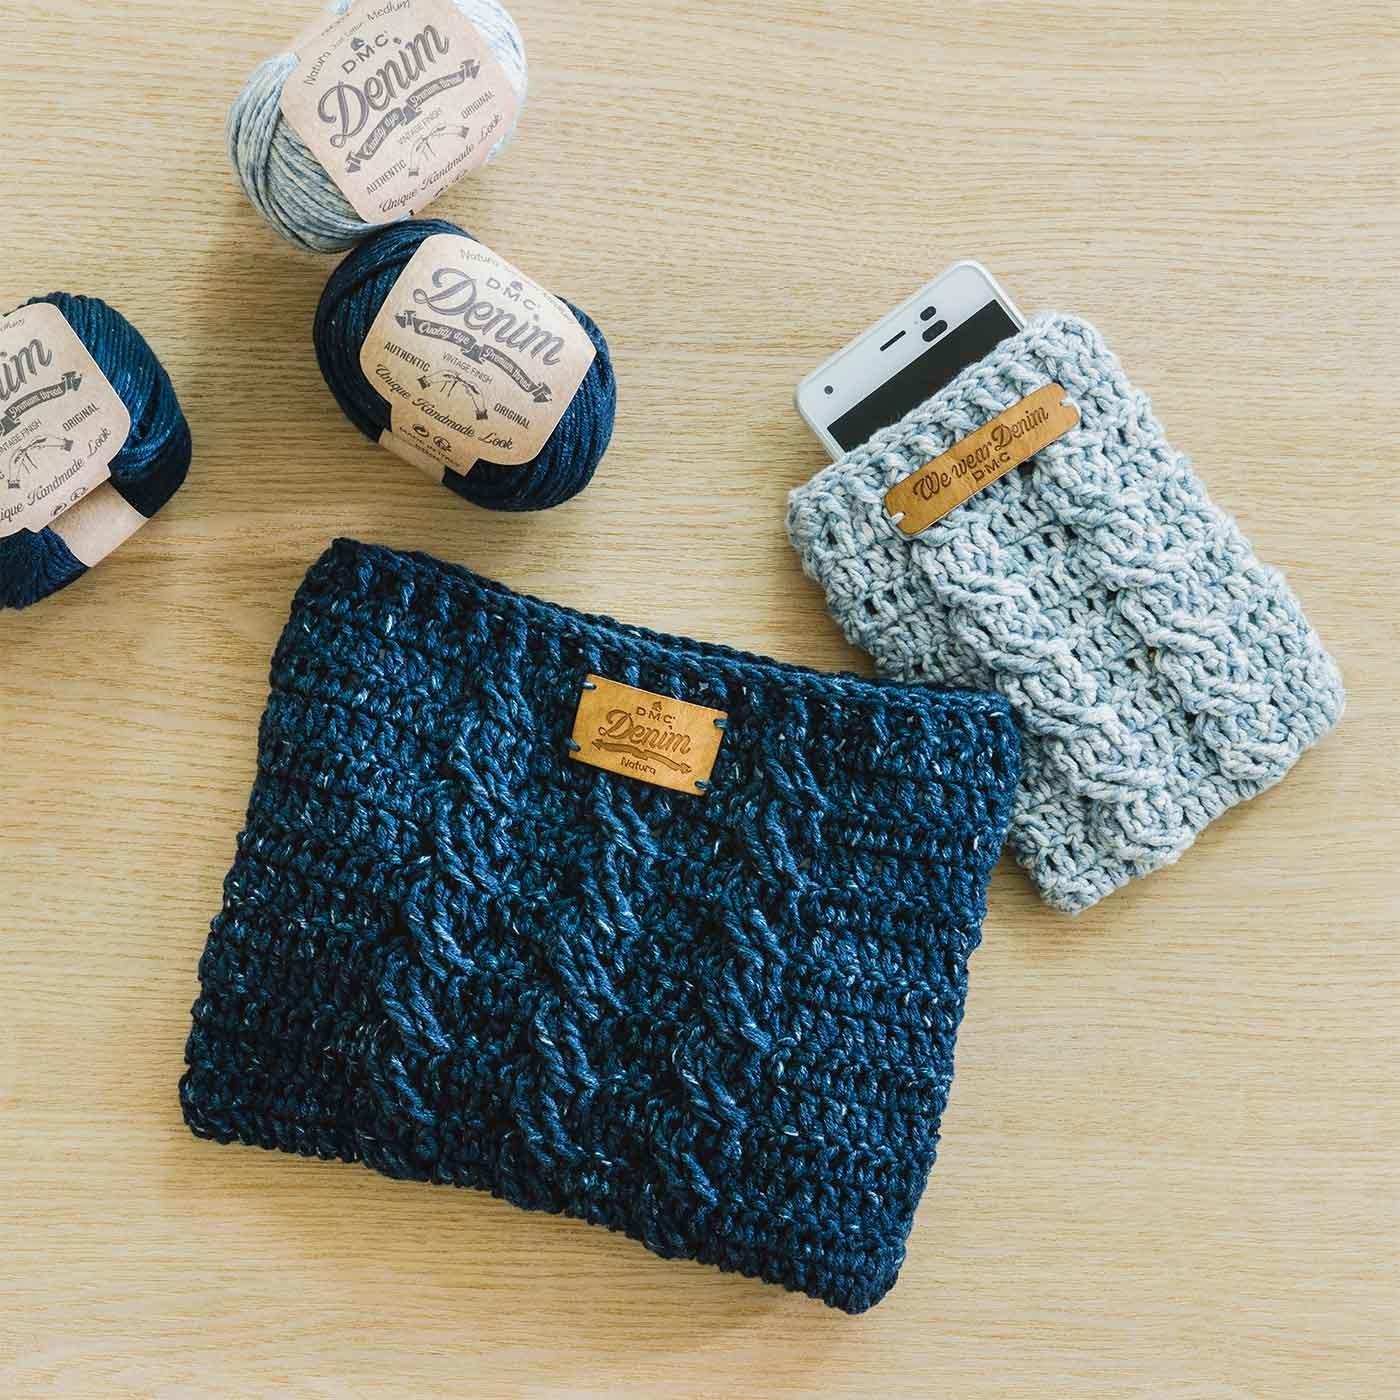 DMC Natura Denim(ナチュラデニム)で編むかぎ針編みミニバッグとスマホケースキット